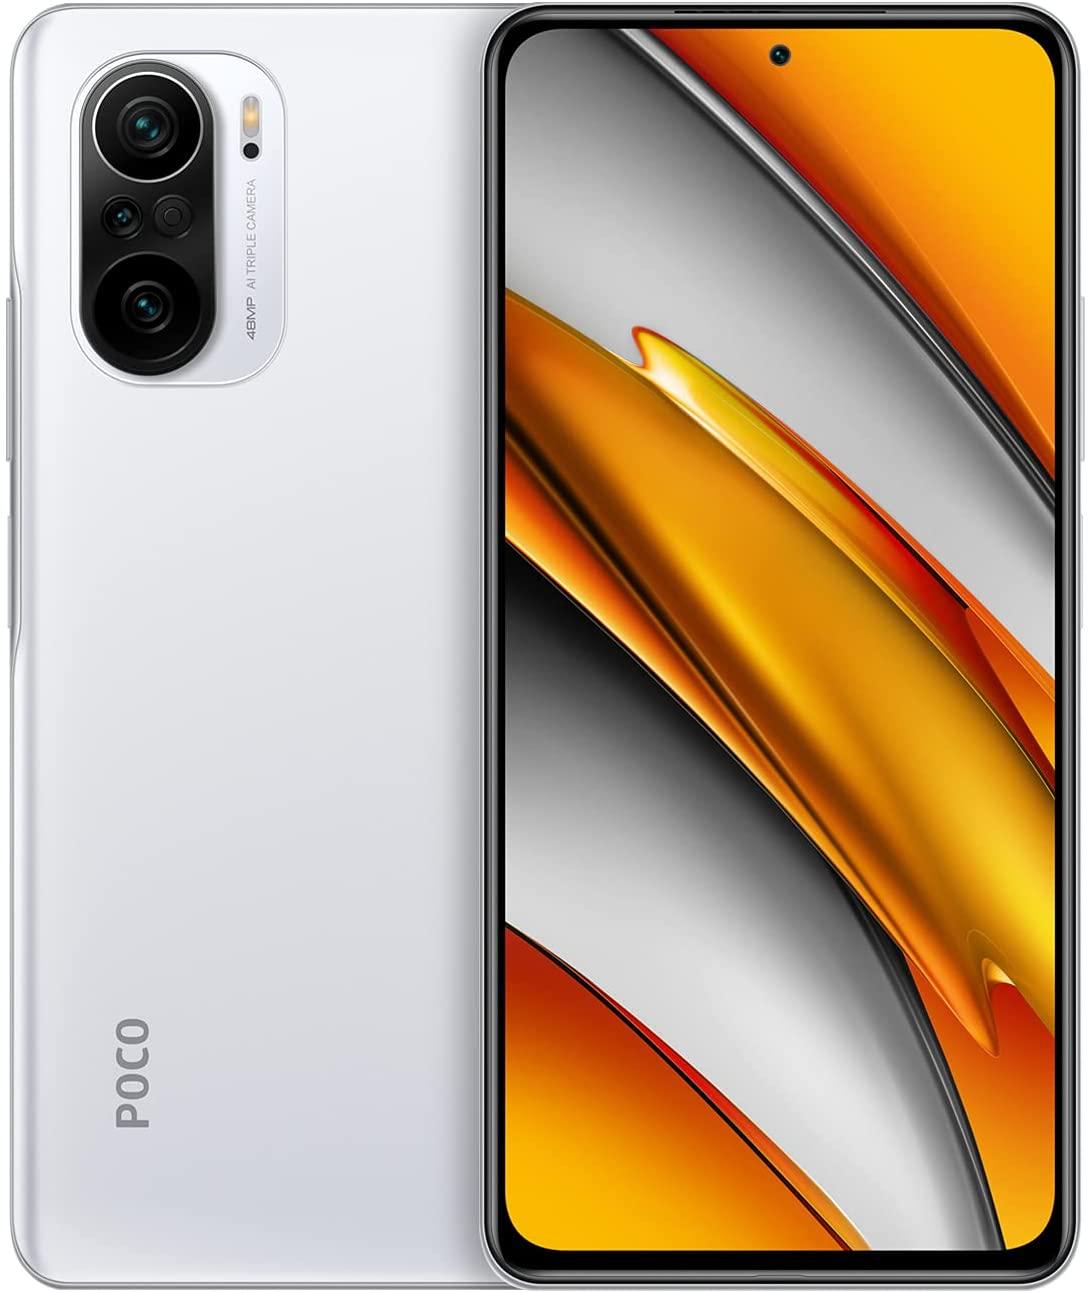 Android, dicas, oneplus, Poco, Realme, Redmi, smartphones, Xiaomi